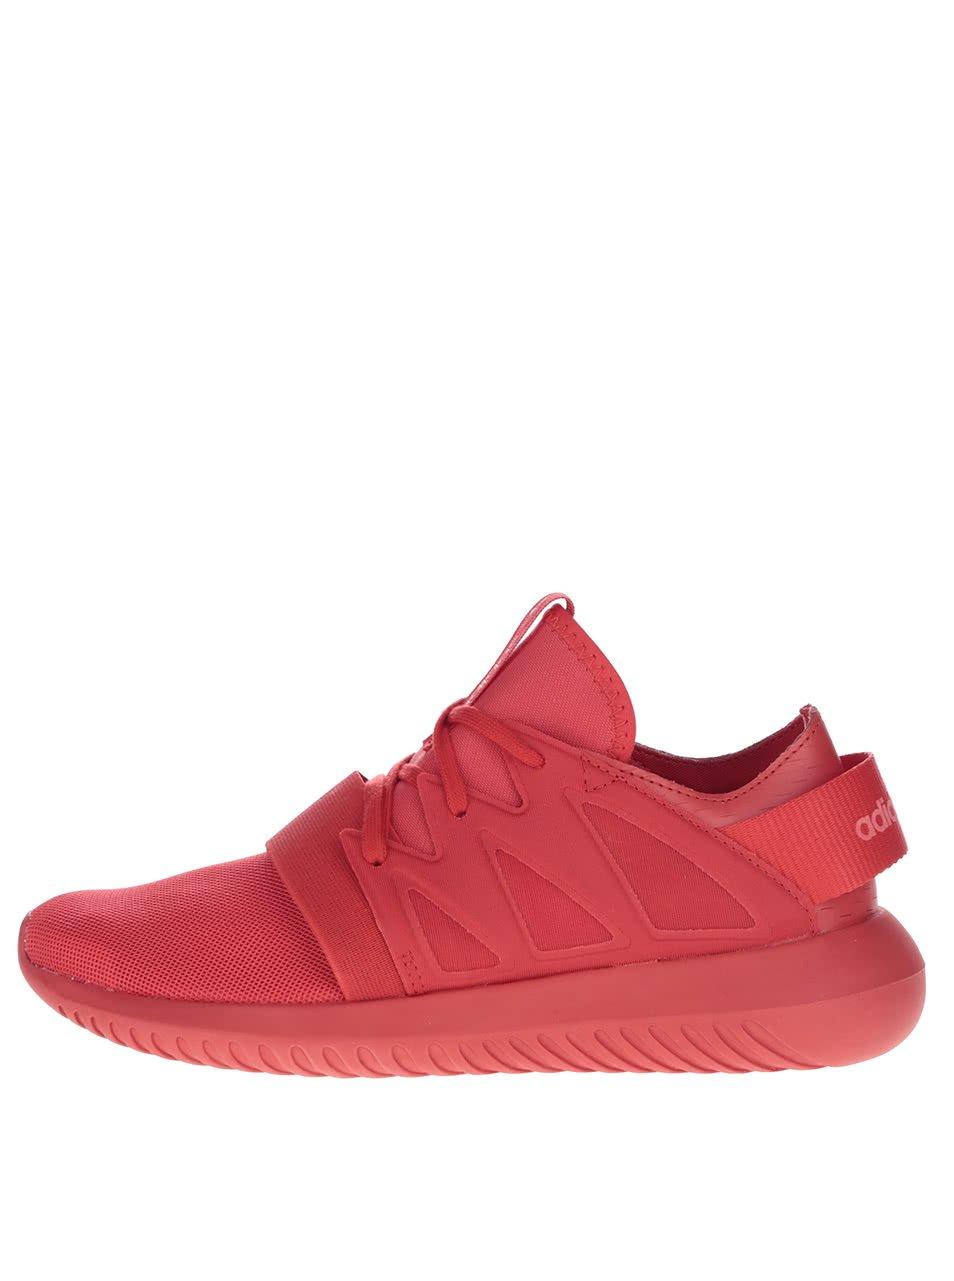 Červené dámské tenisky adidas Originals Tubular